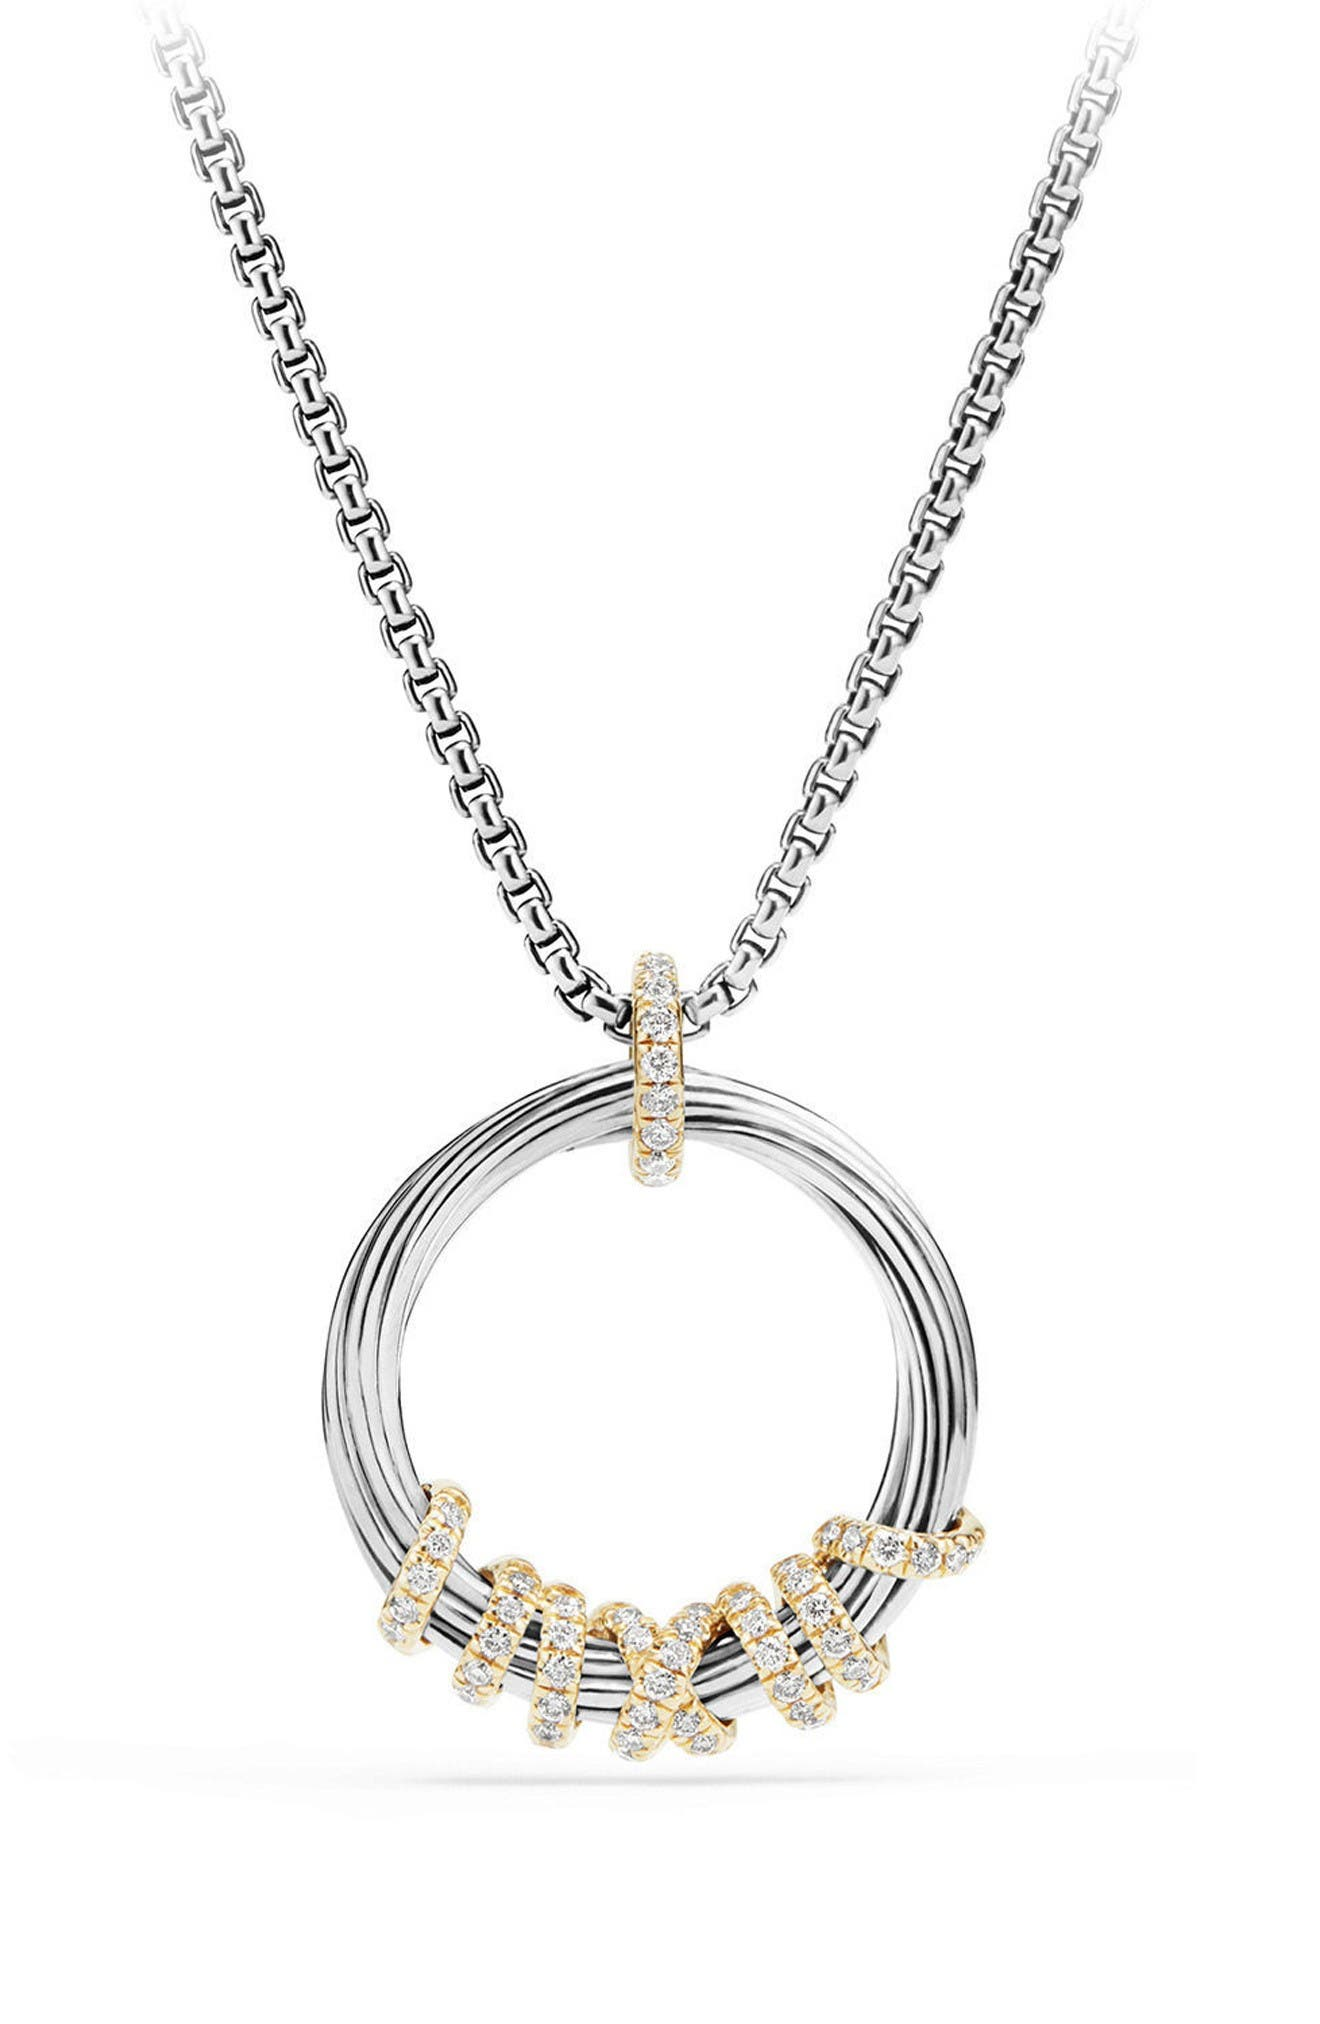 Main Image - David Yurman Helena Medium Pendant Necklace with Diamonds & 18K Gold